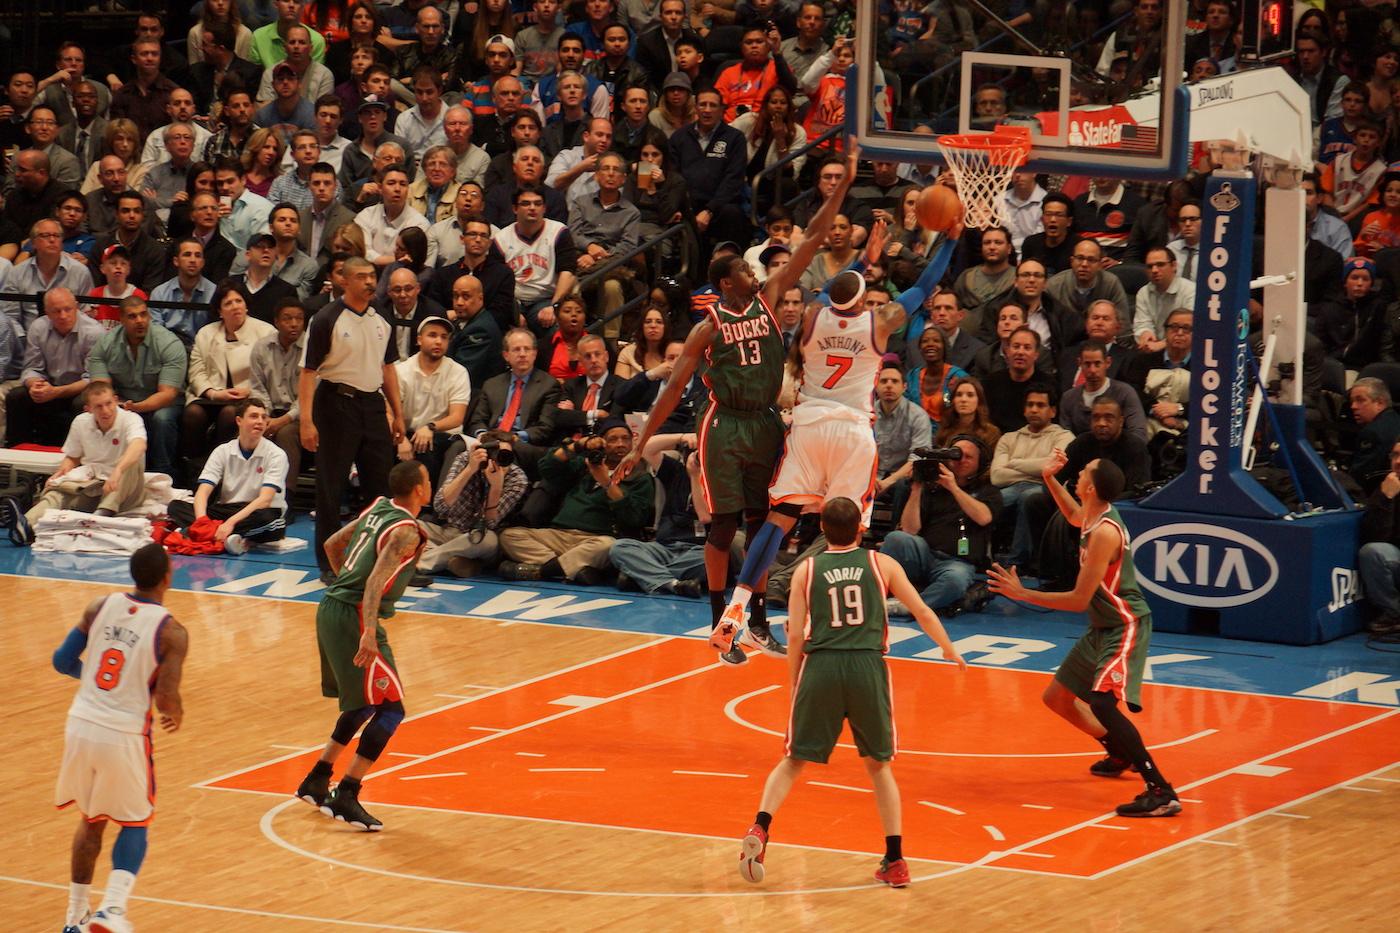 billets NBA New York au Madison Square Garden